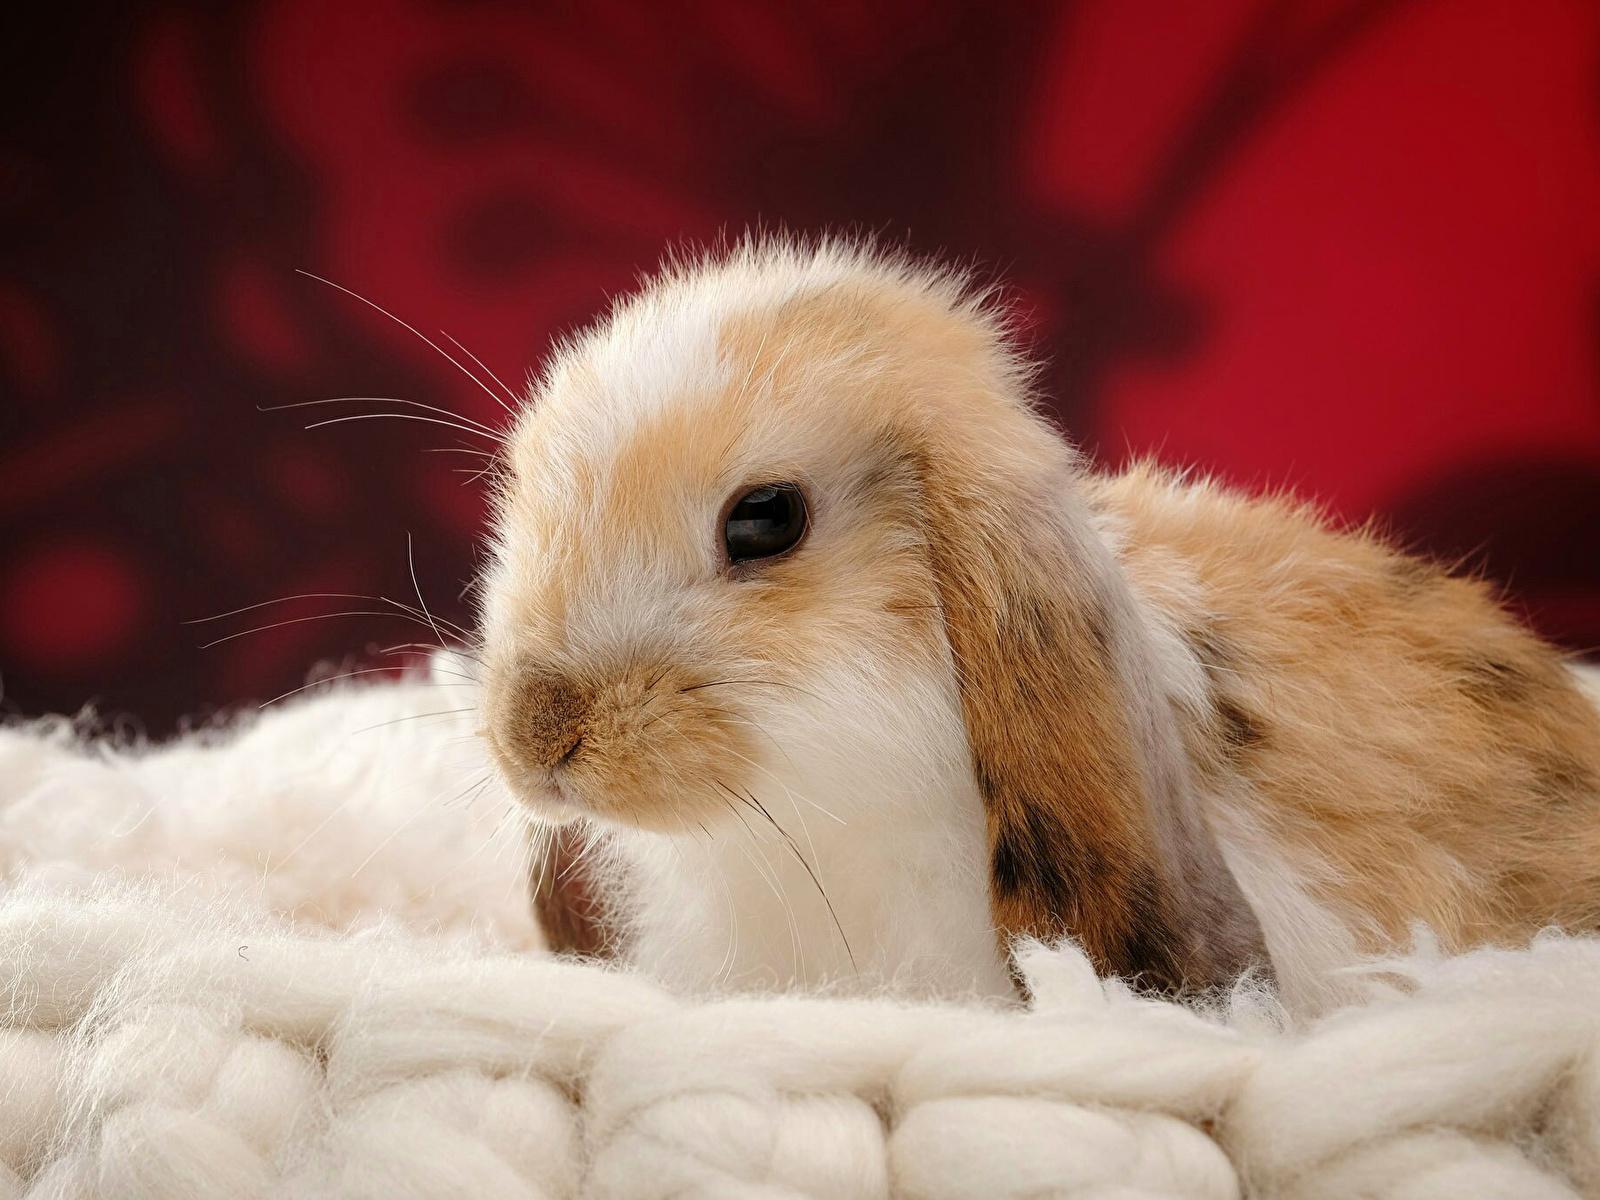 Desktop Wallpapers Rabbits Head Animals 1600x1200 rabbit animal